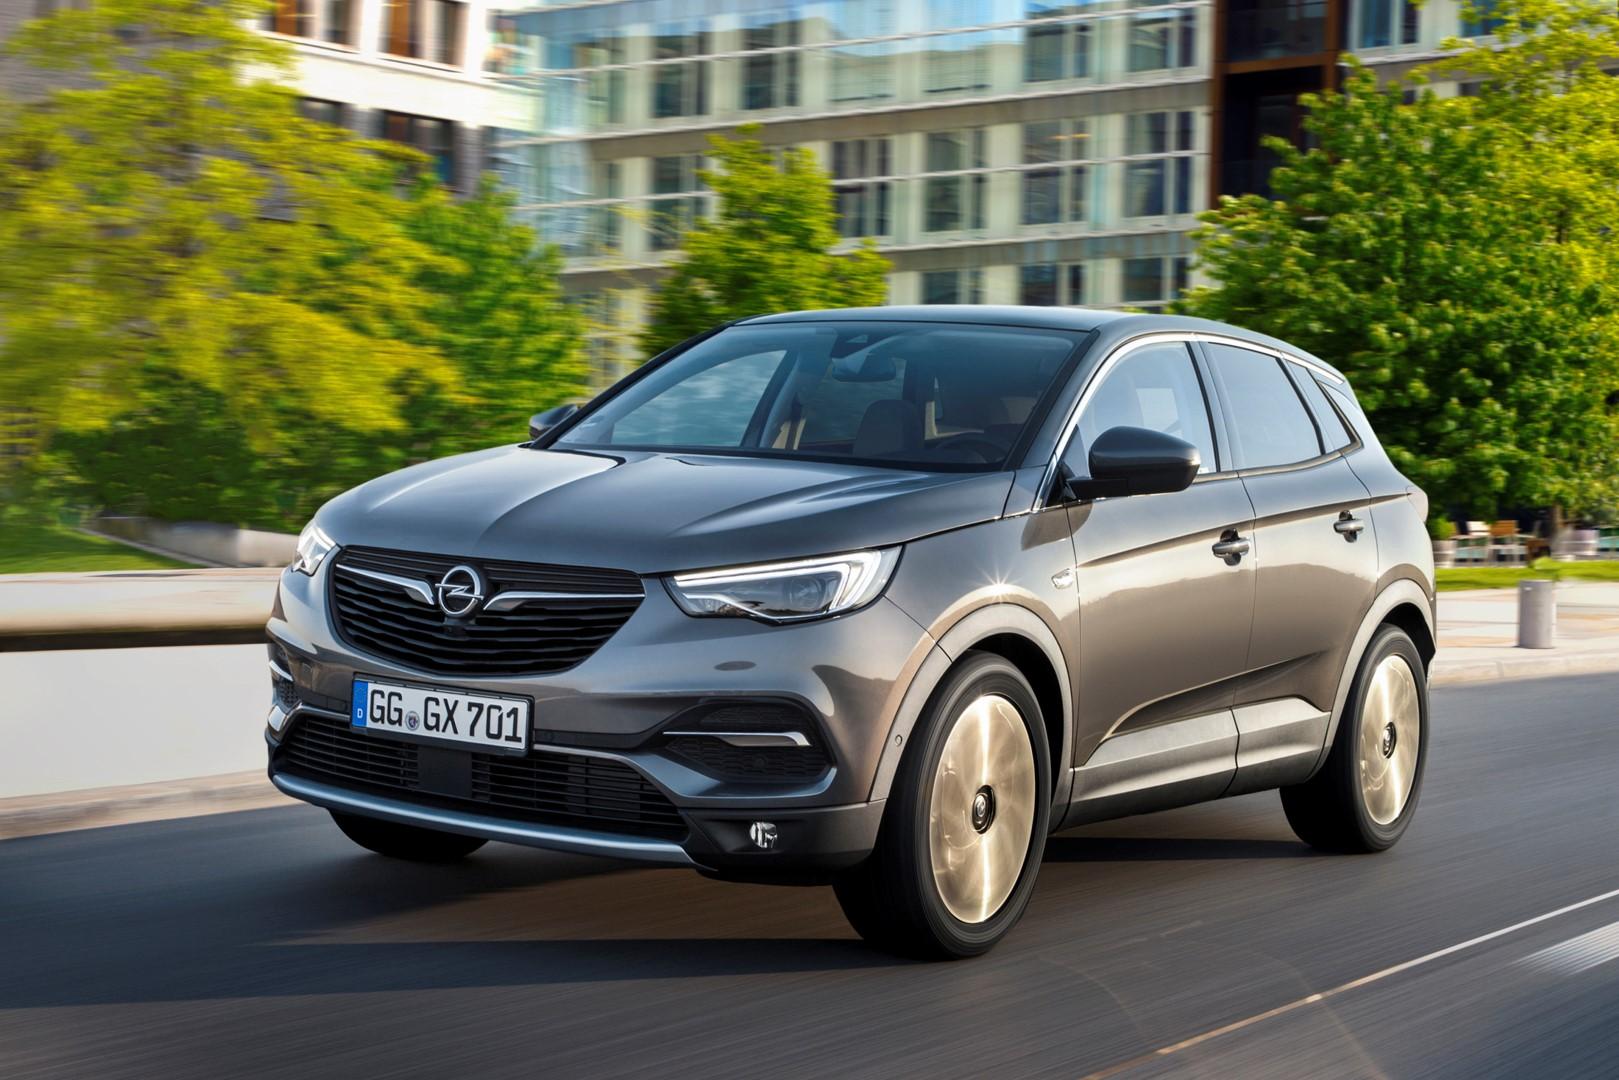 Fotospecial: Opel Grandland X 2017 - Dagelijksauto.nl